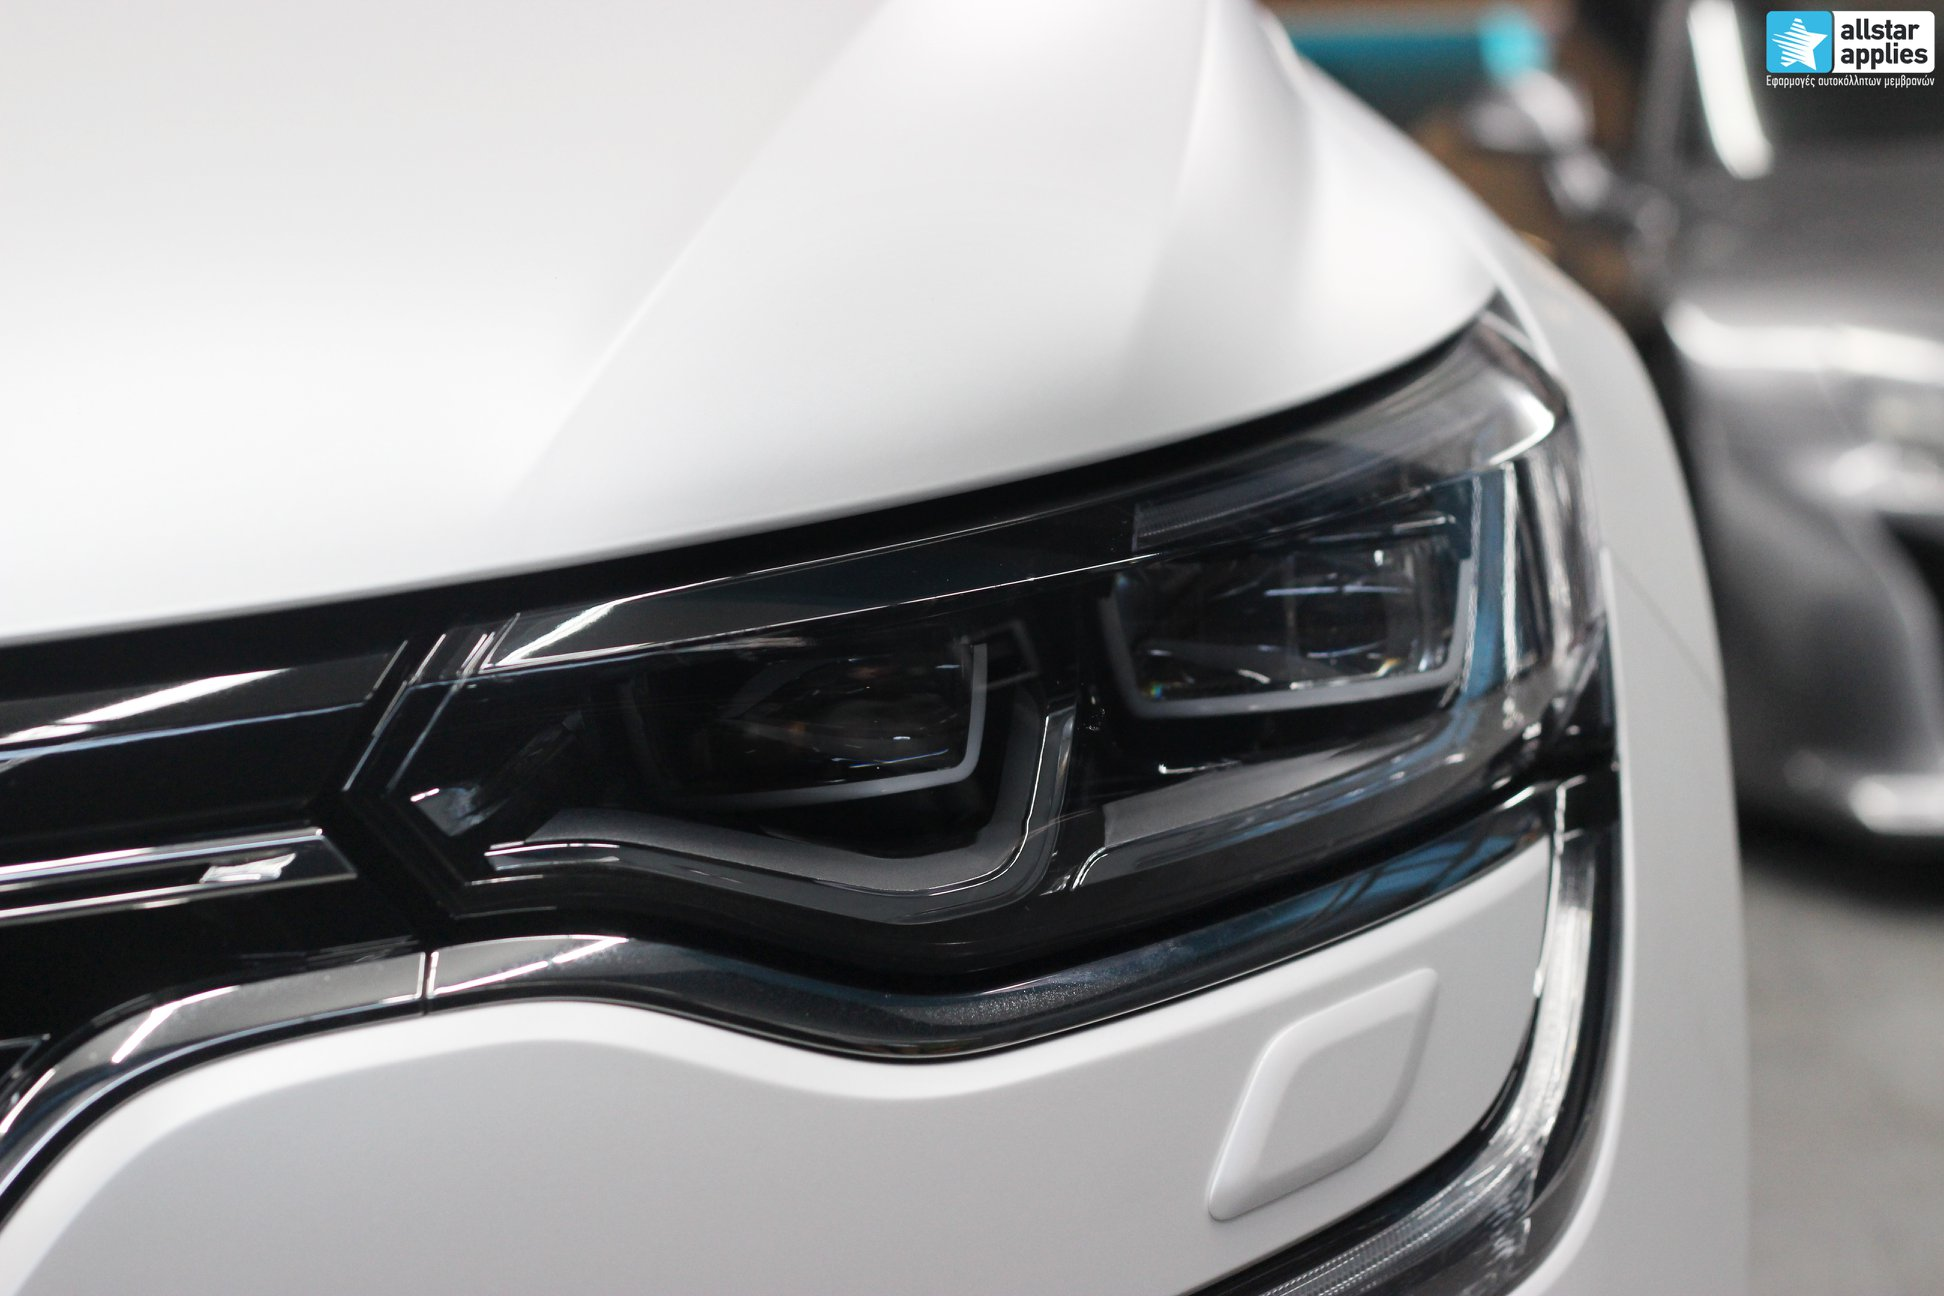 Renault Talisman - Satin Pearl White (15)